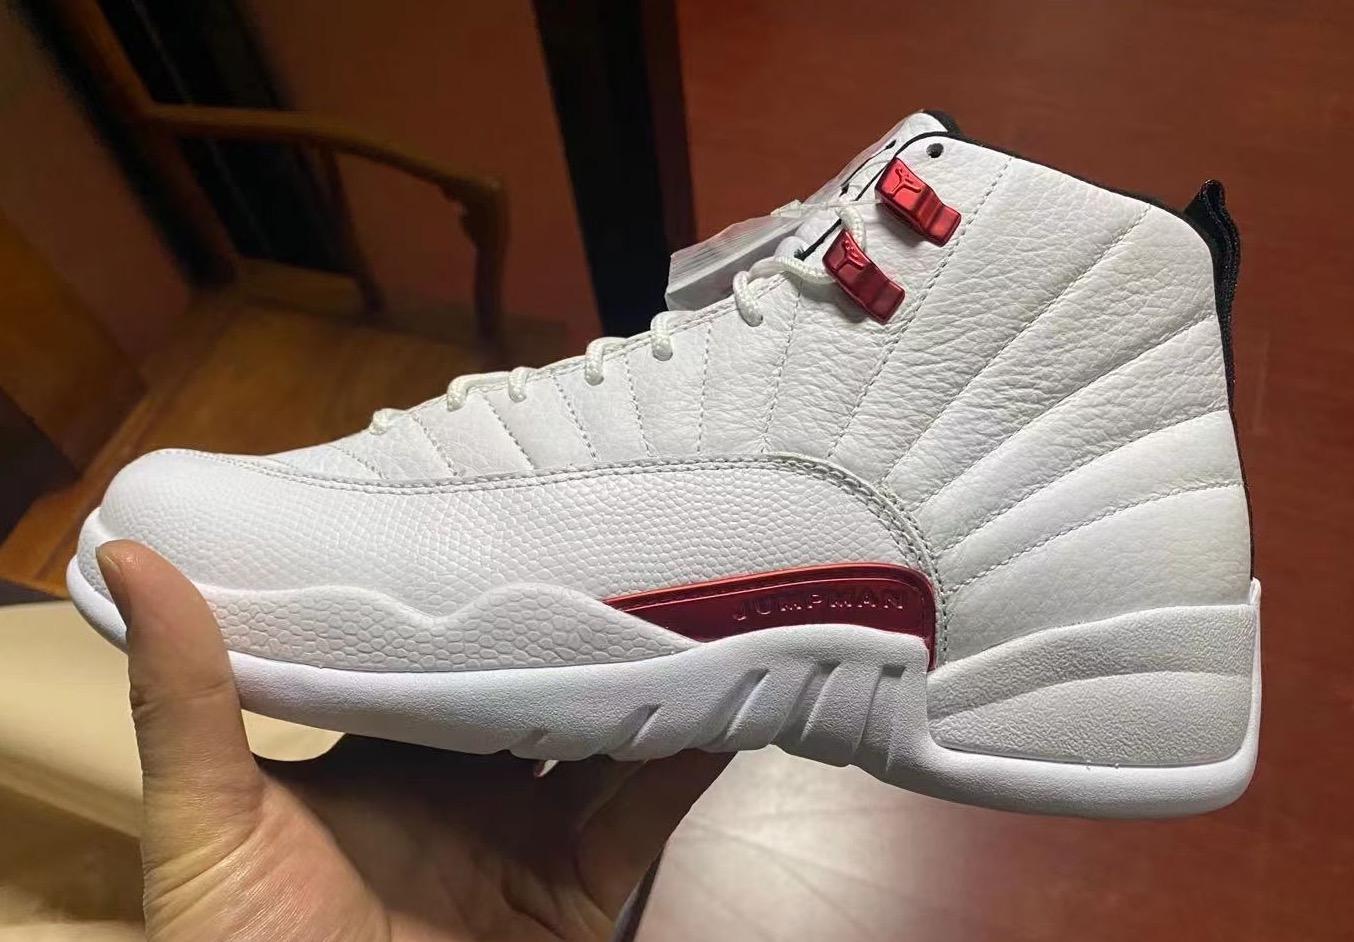 Release Date: Air Jordan 12 'Twist'